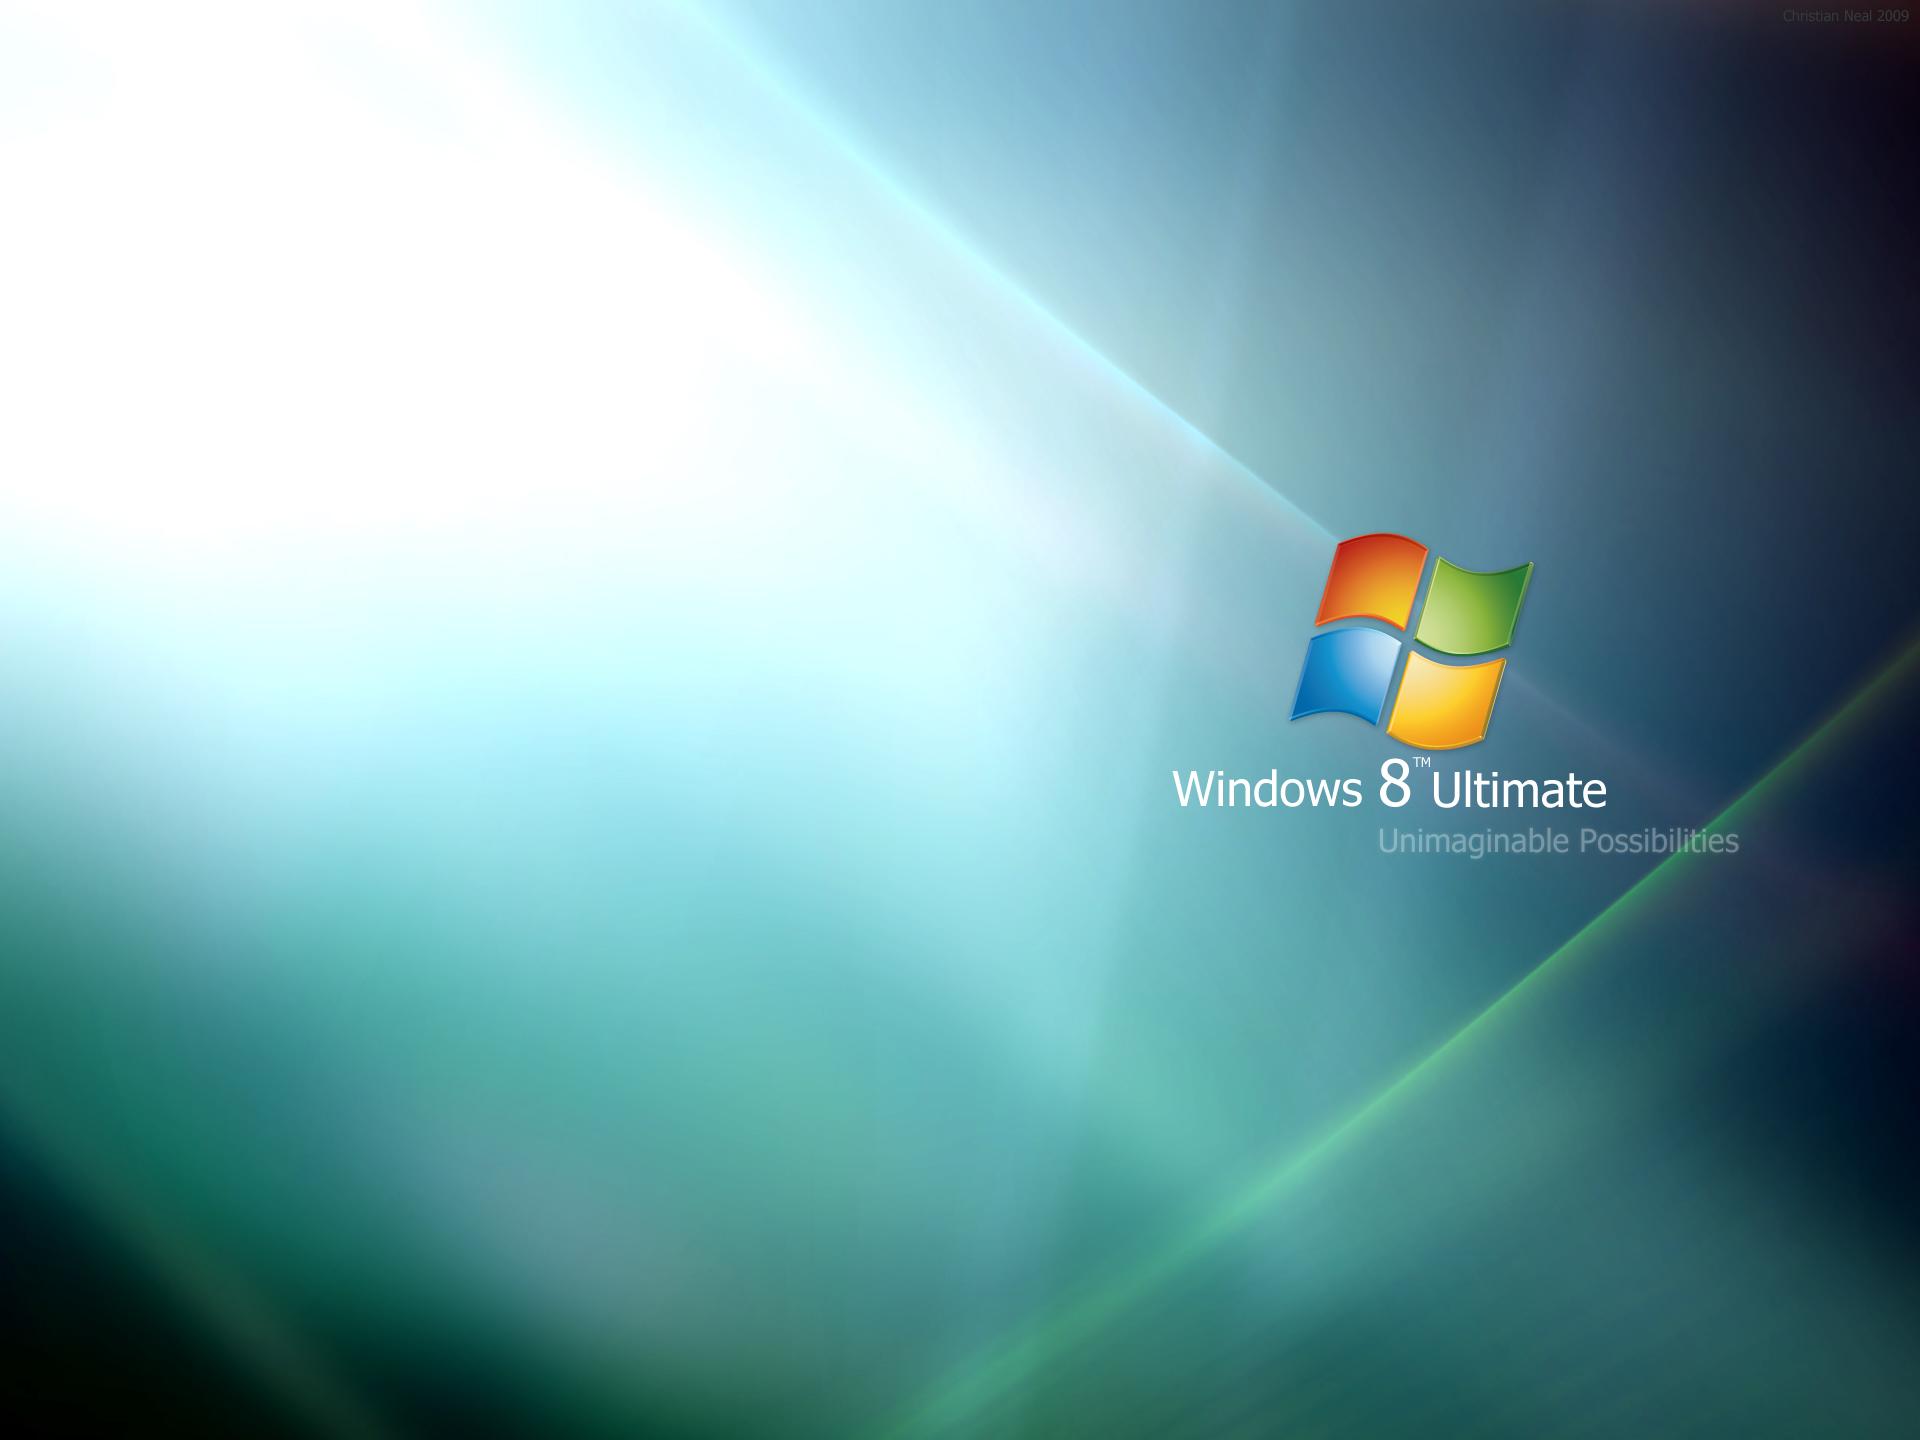 4k live wallpaper windows 10 wallpapersafari - Windows 10 4k wallpaper pack ...